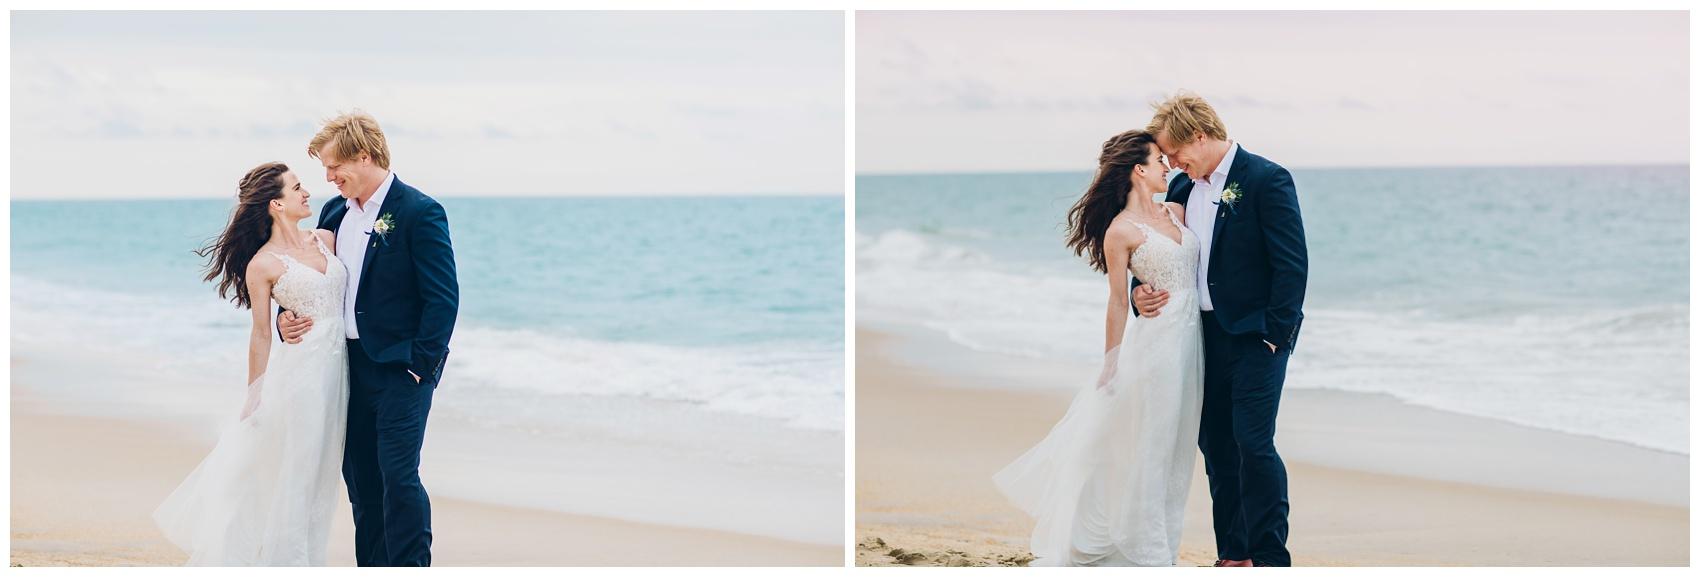 Outer-Banks-Corolla-Wedding_0085.jpg